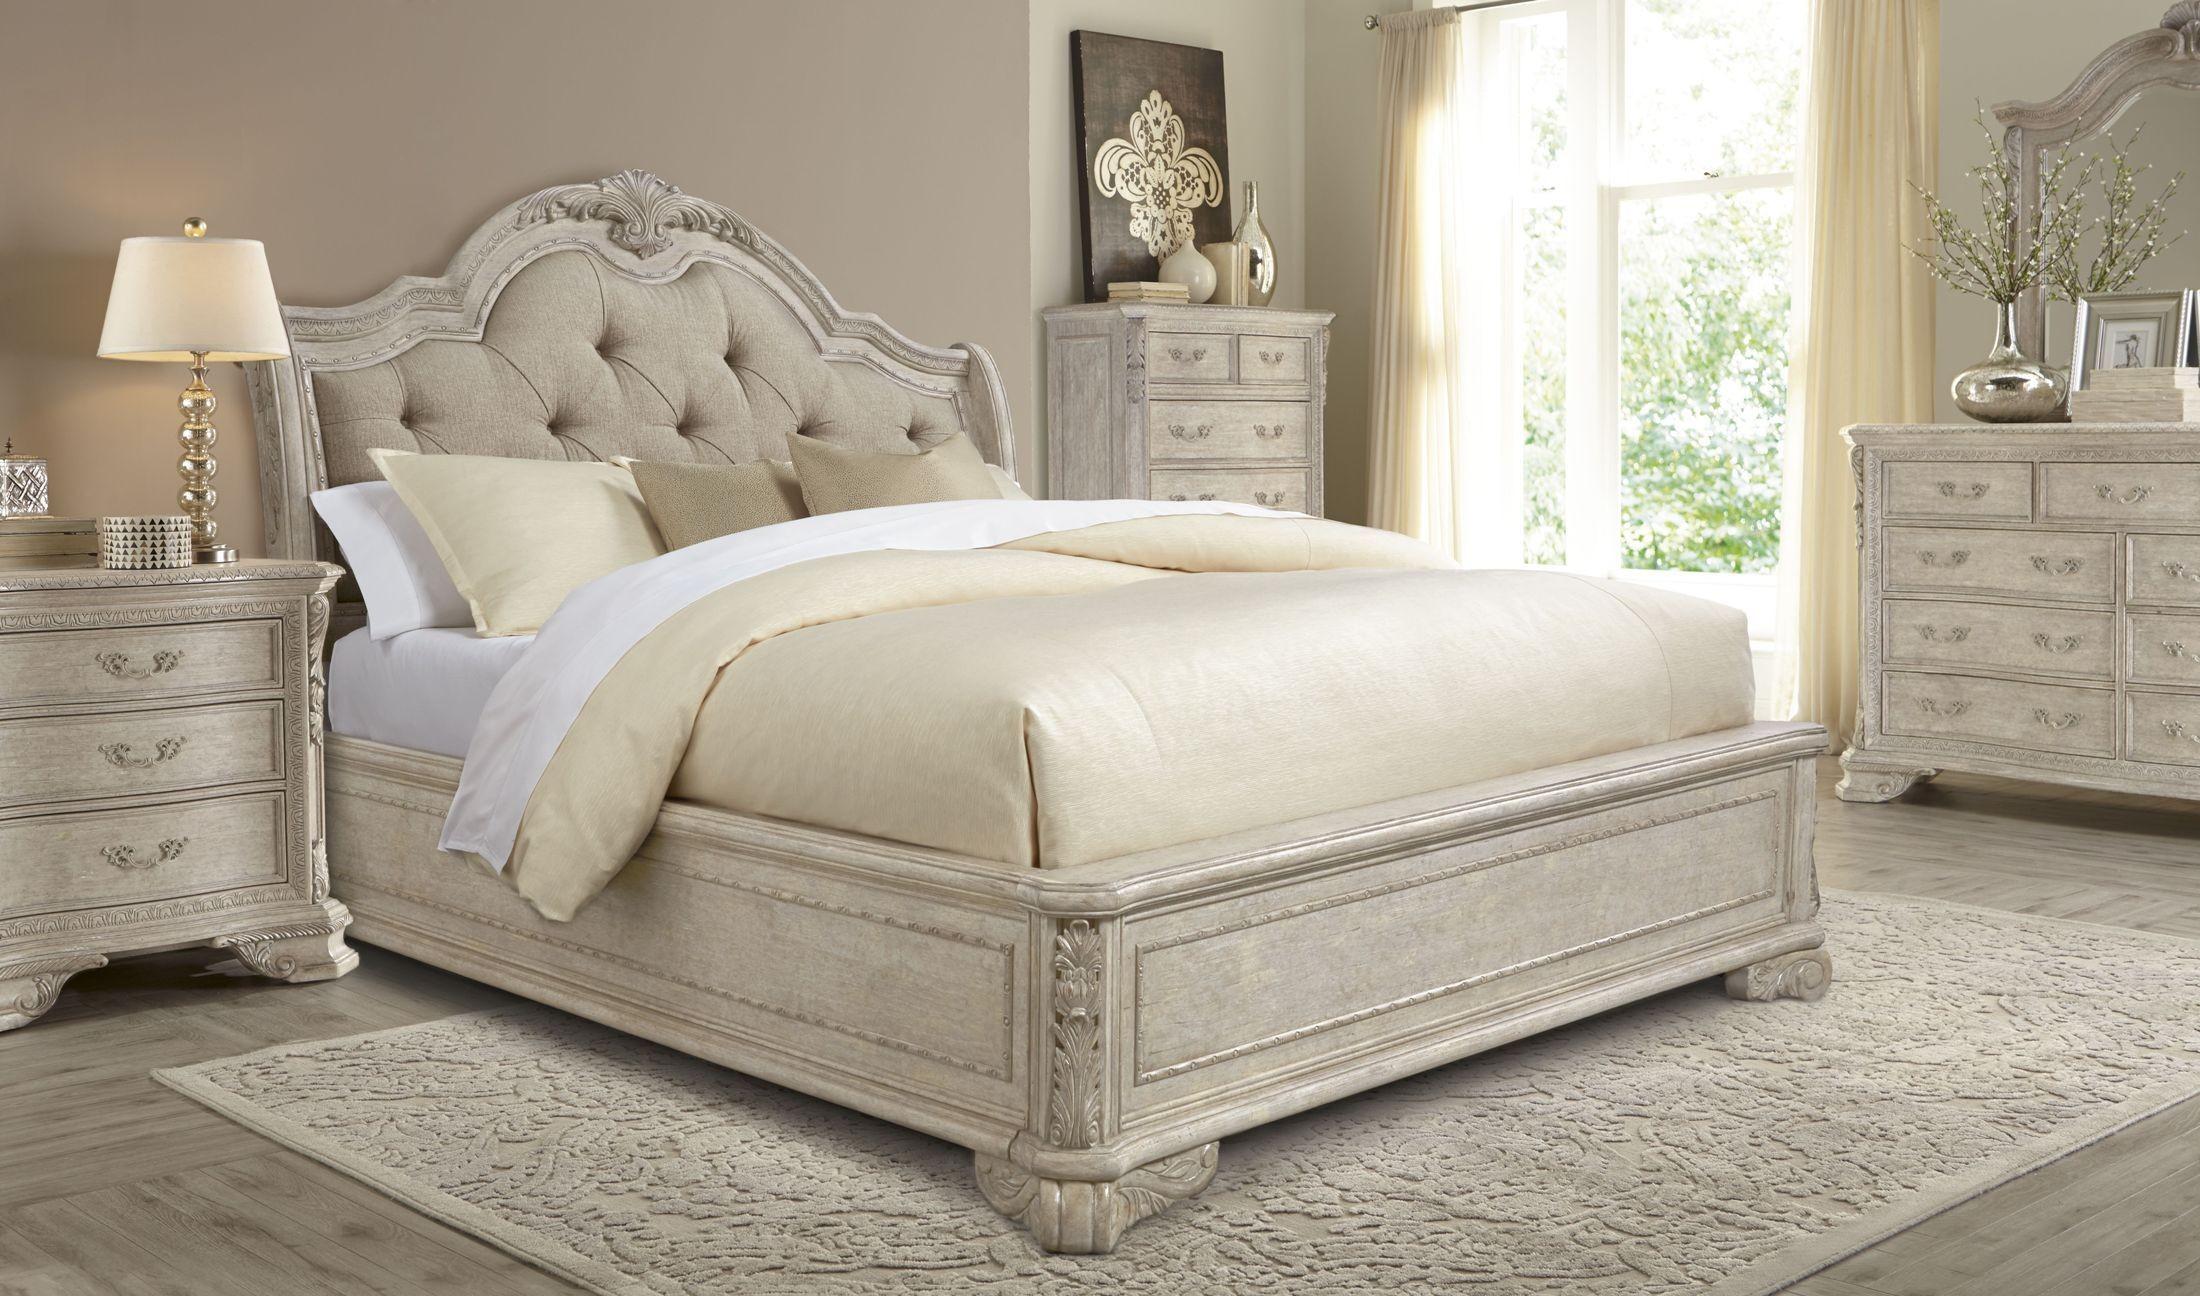 renaissance dove grey sleigh upholstered bedroom set from art 243125